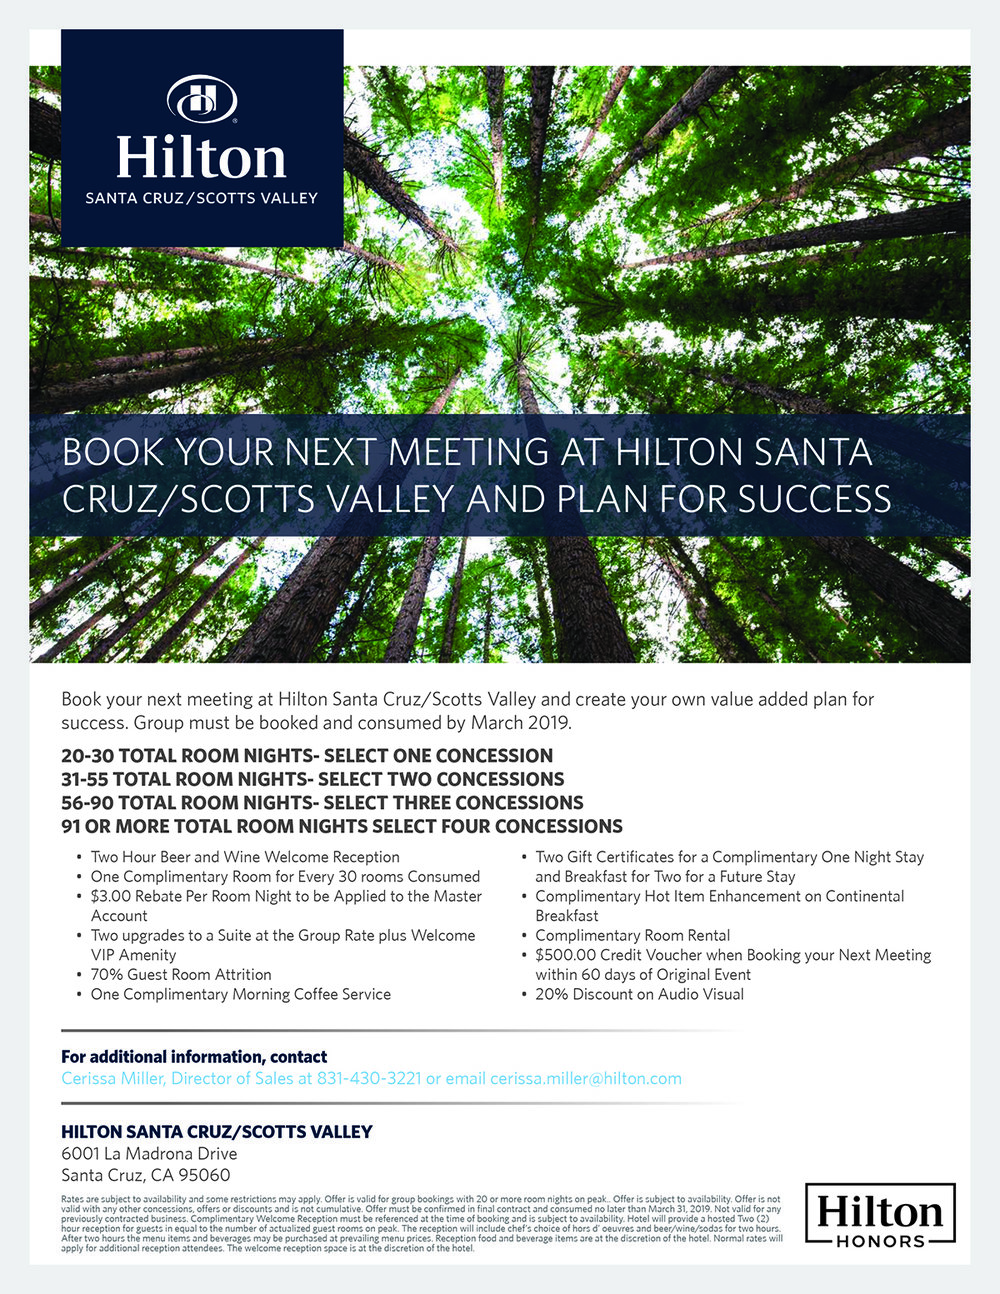 hilton scotts valley promotion for groups.jpg